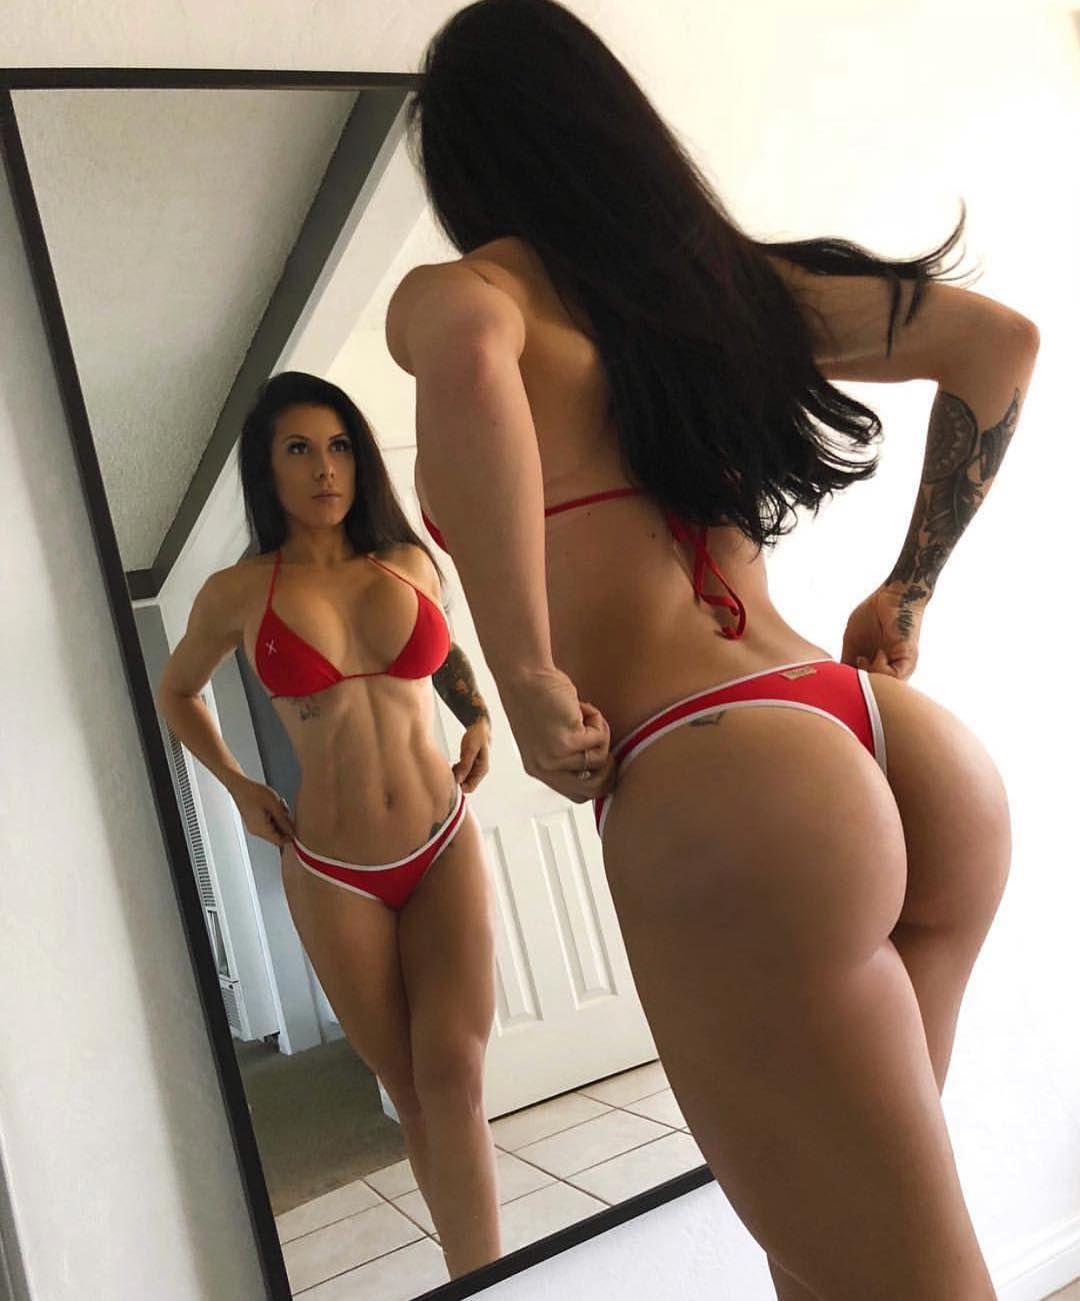 savanna rehm | beautiful, fit & sexy | pinterest | man women, boobs